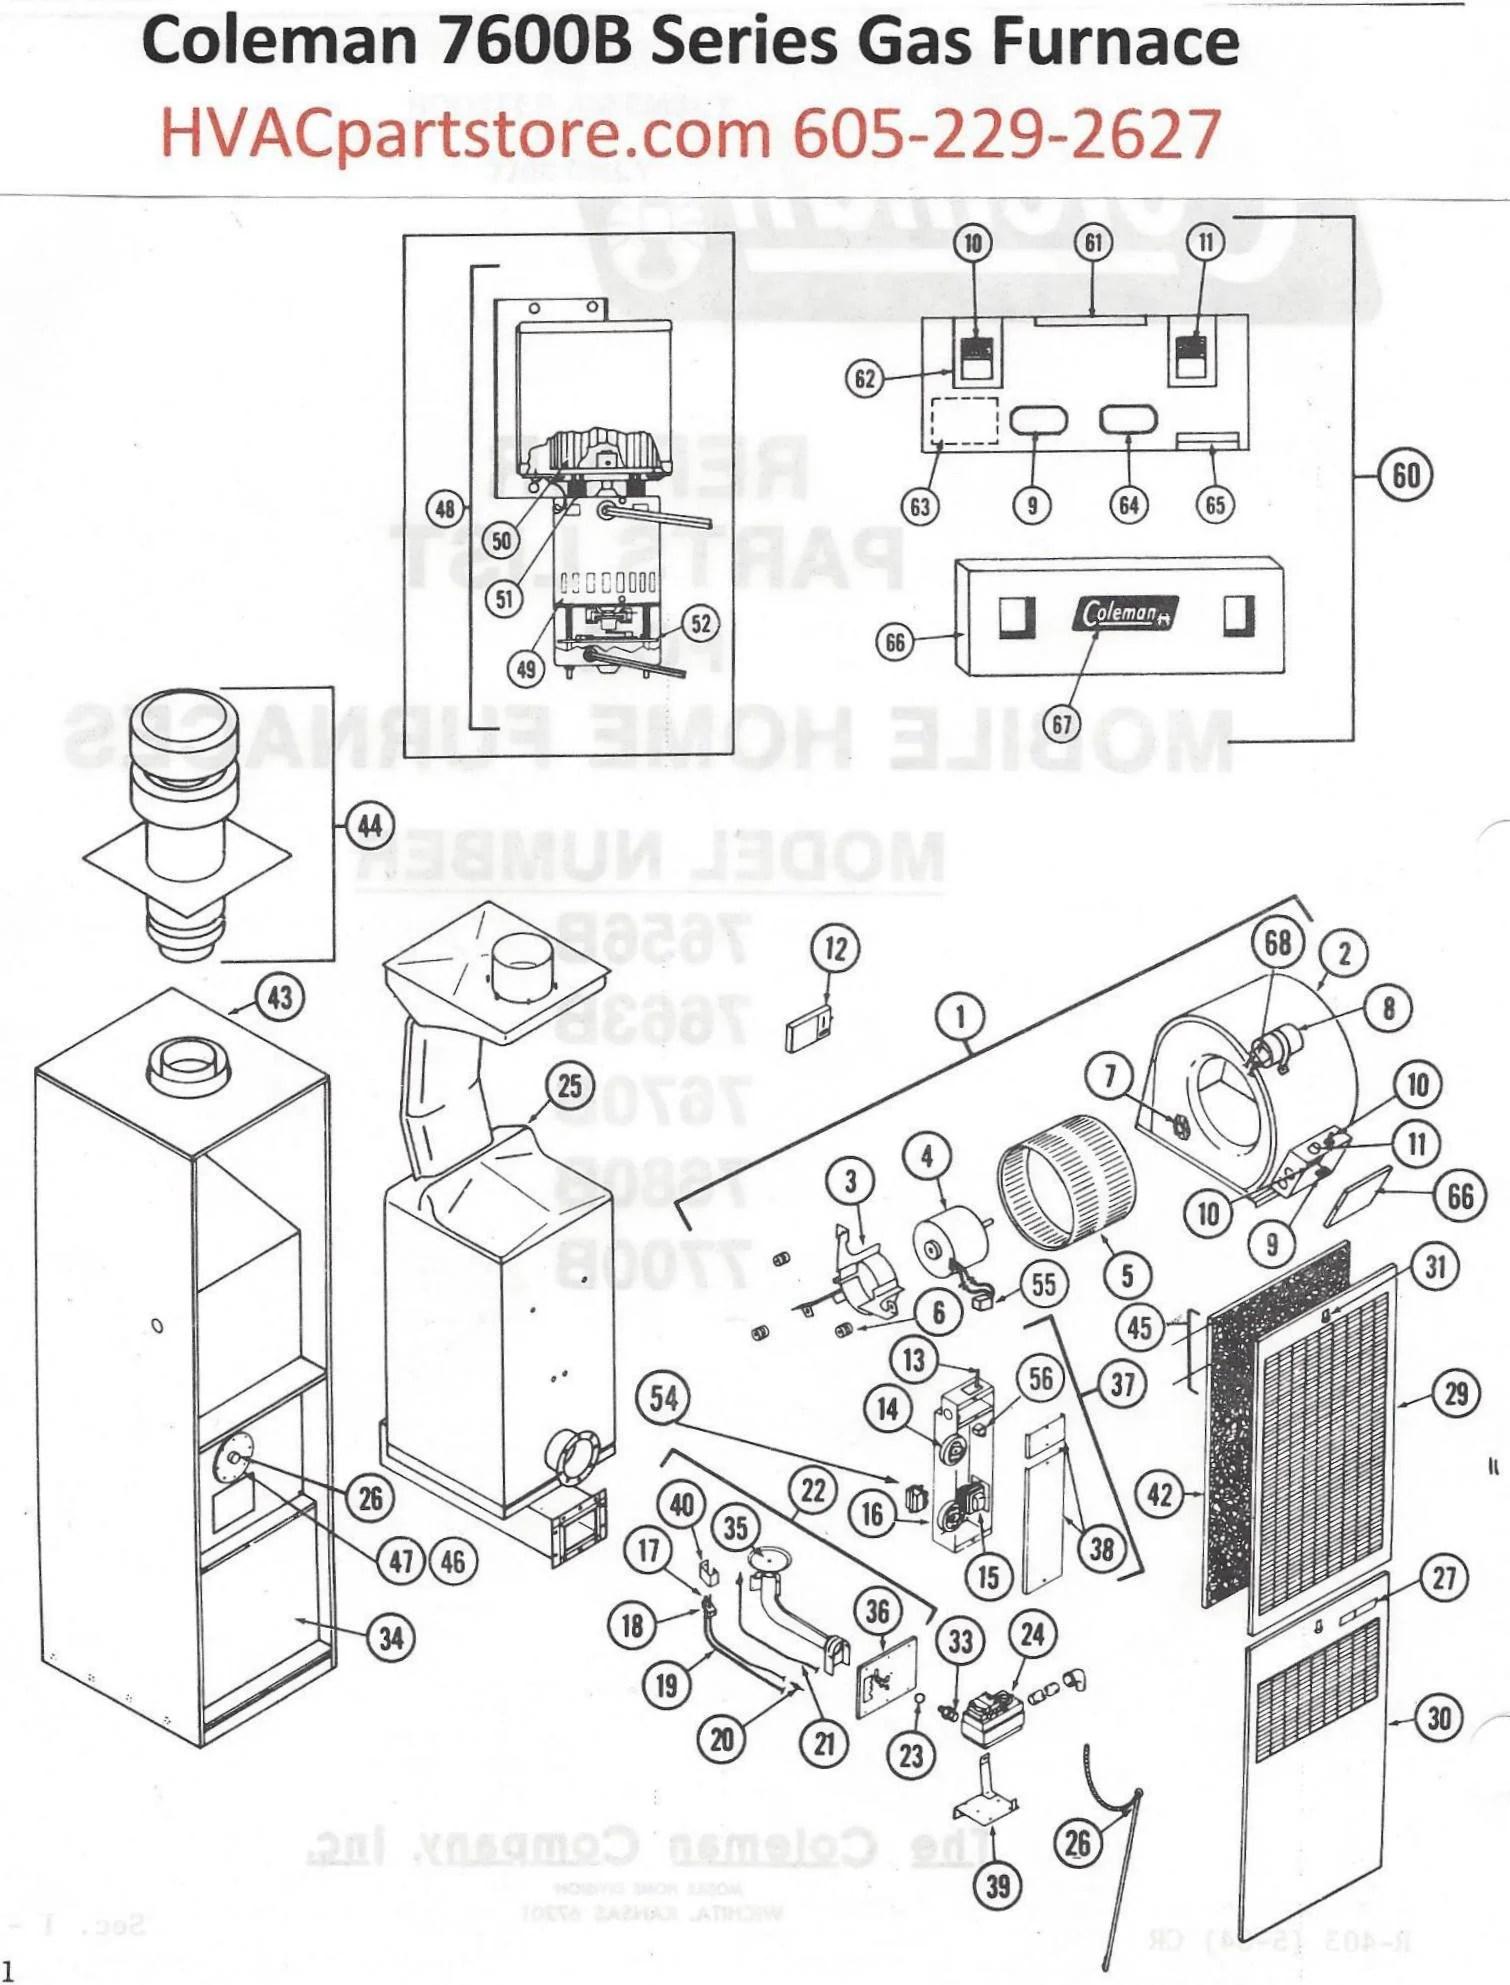 7663B856 Coleman Gas Furnace Parts – HVACpartstore